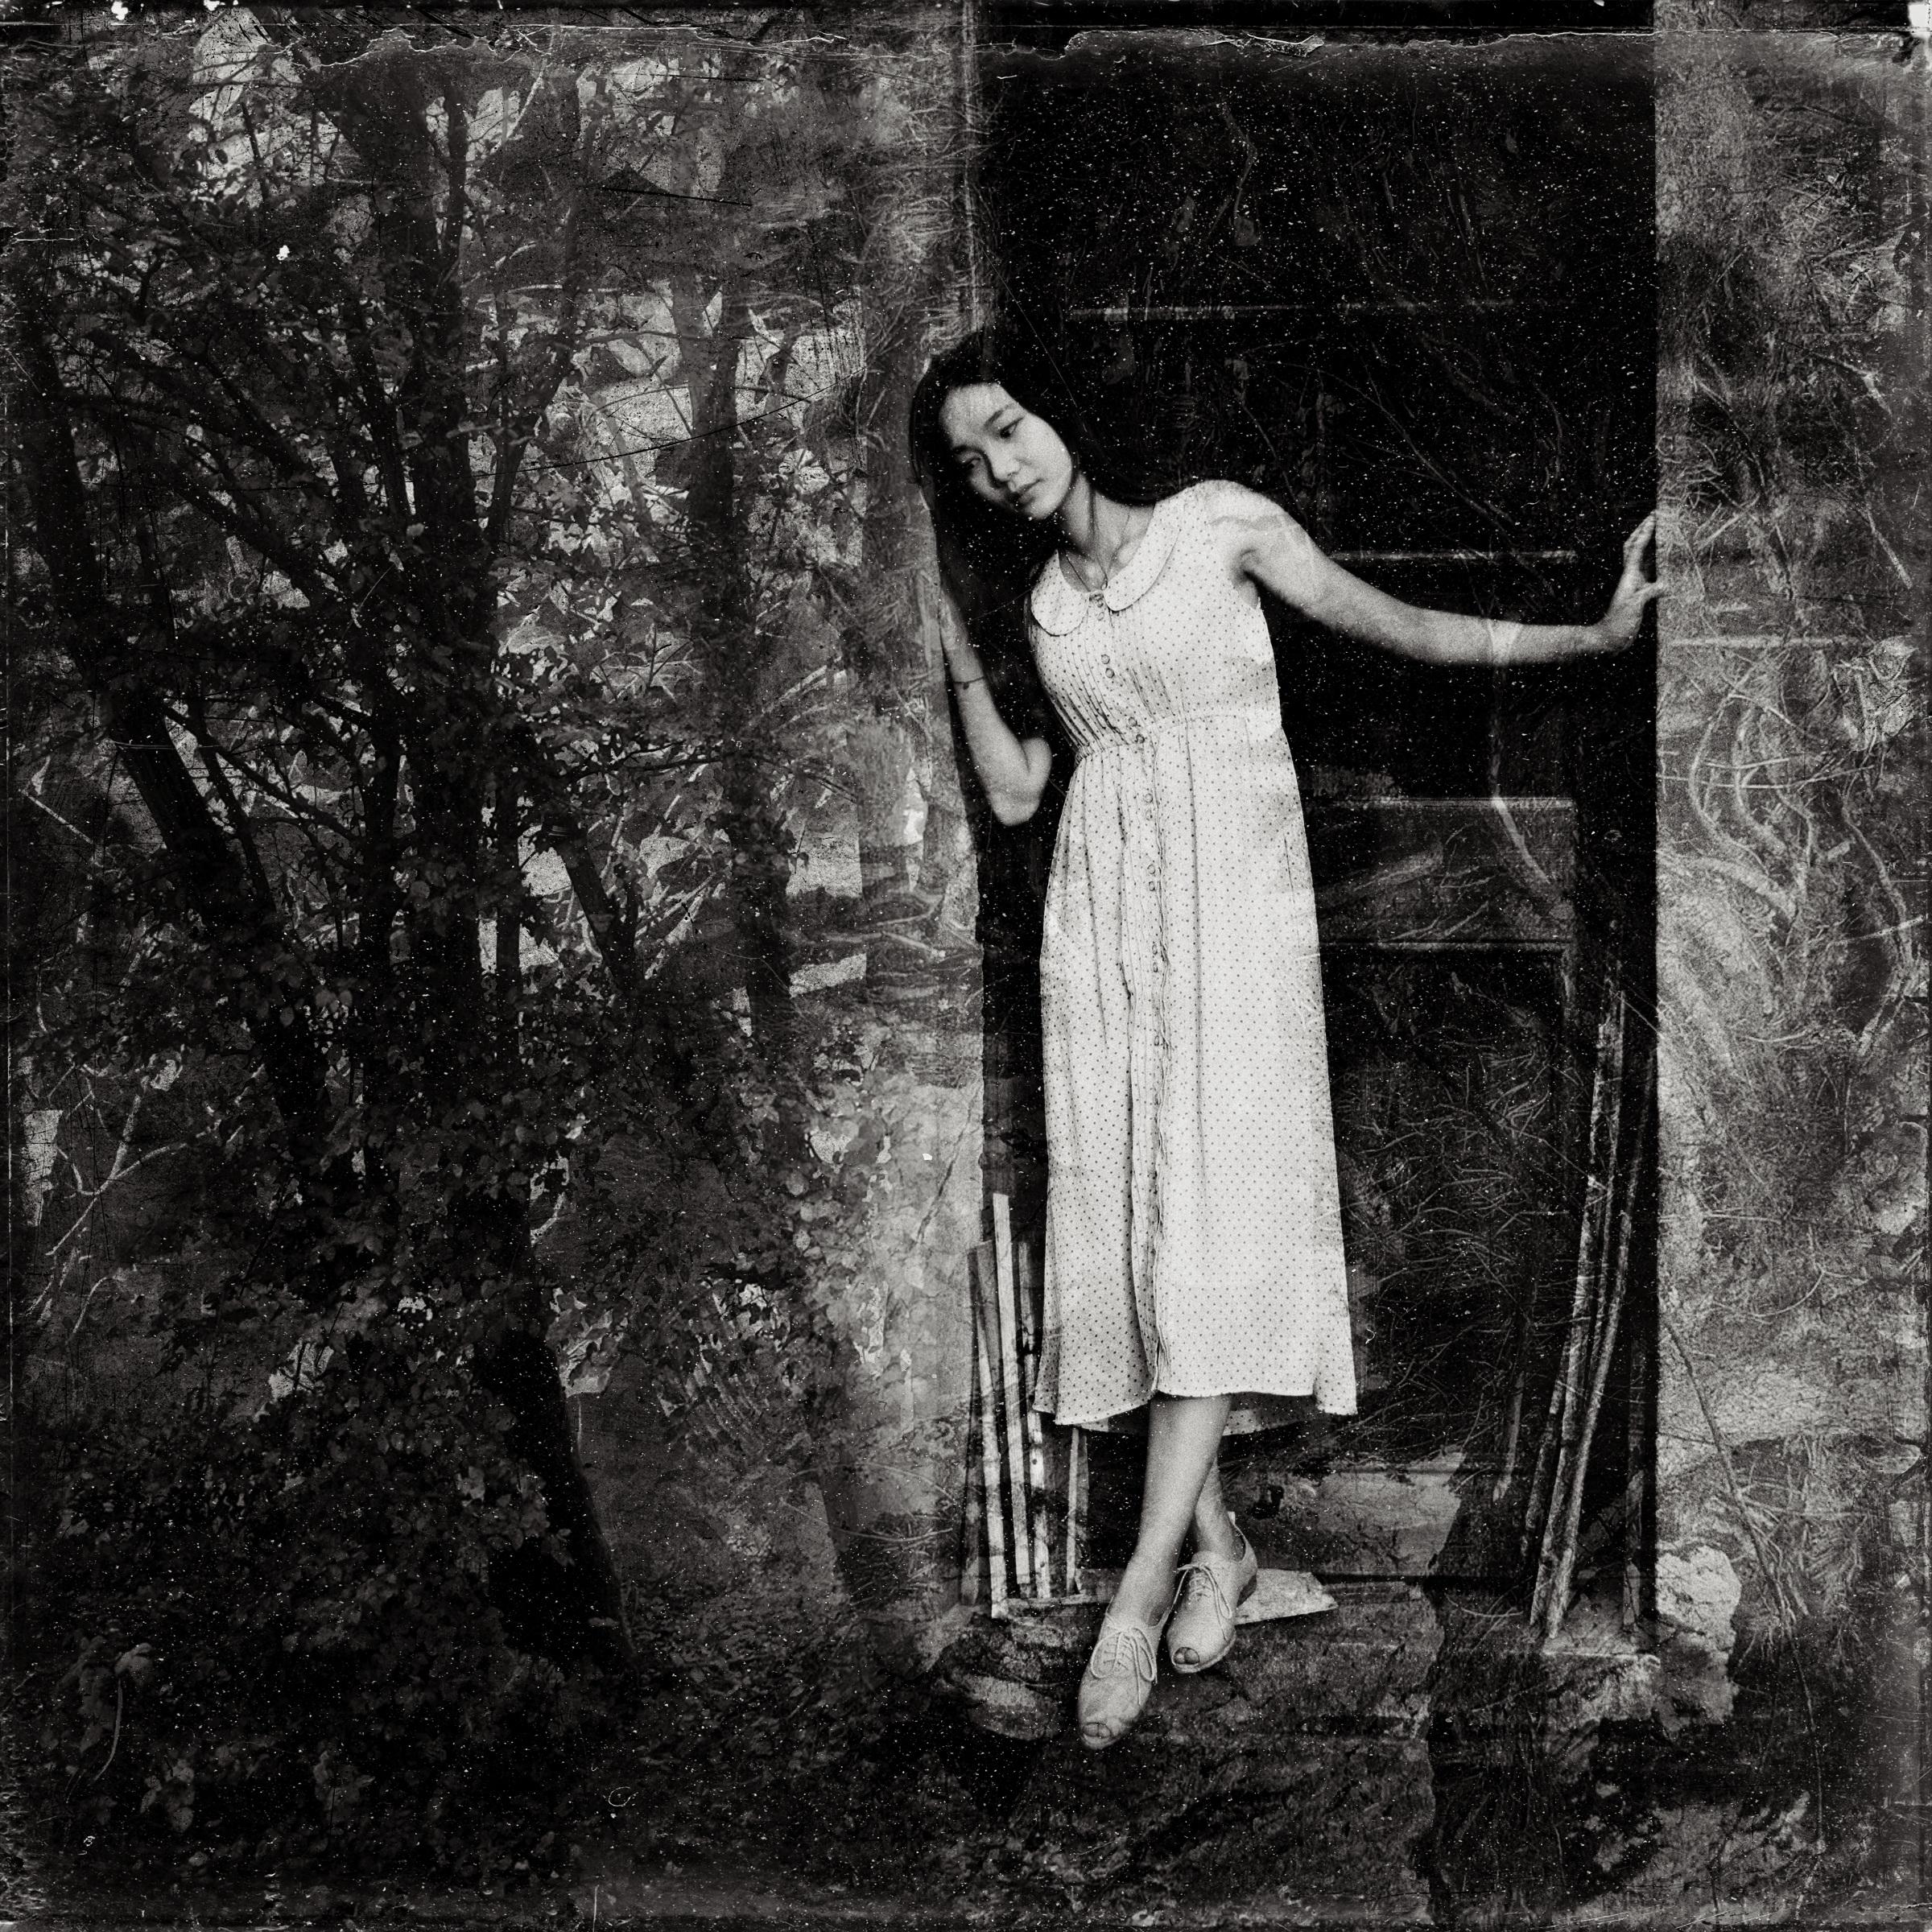 Landscape tree nature forest light black and white girl woman fog dark foliage sadness monochrome door